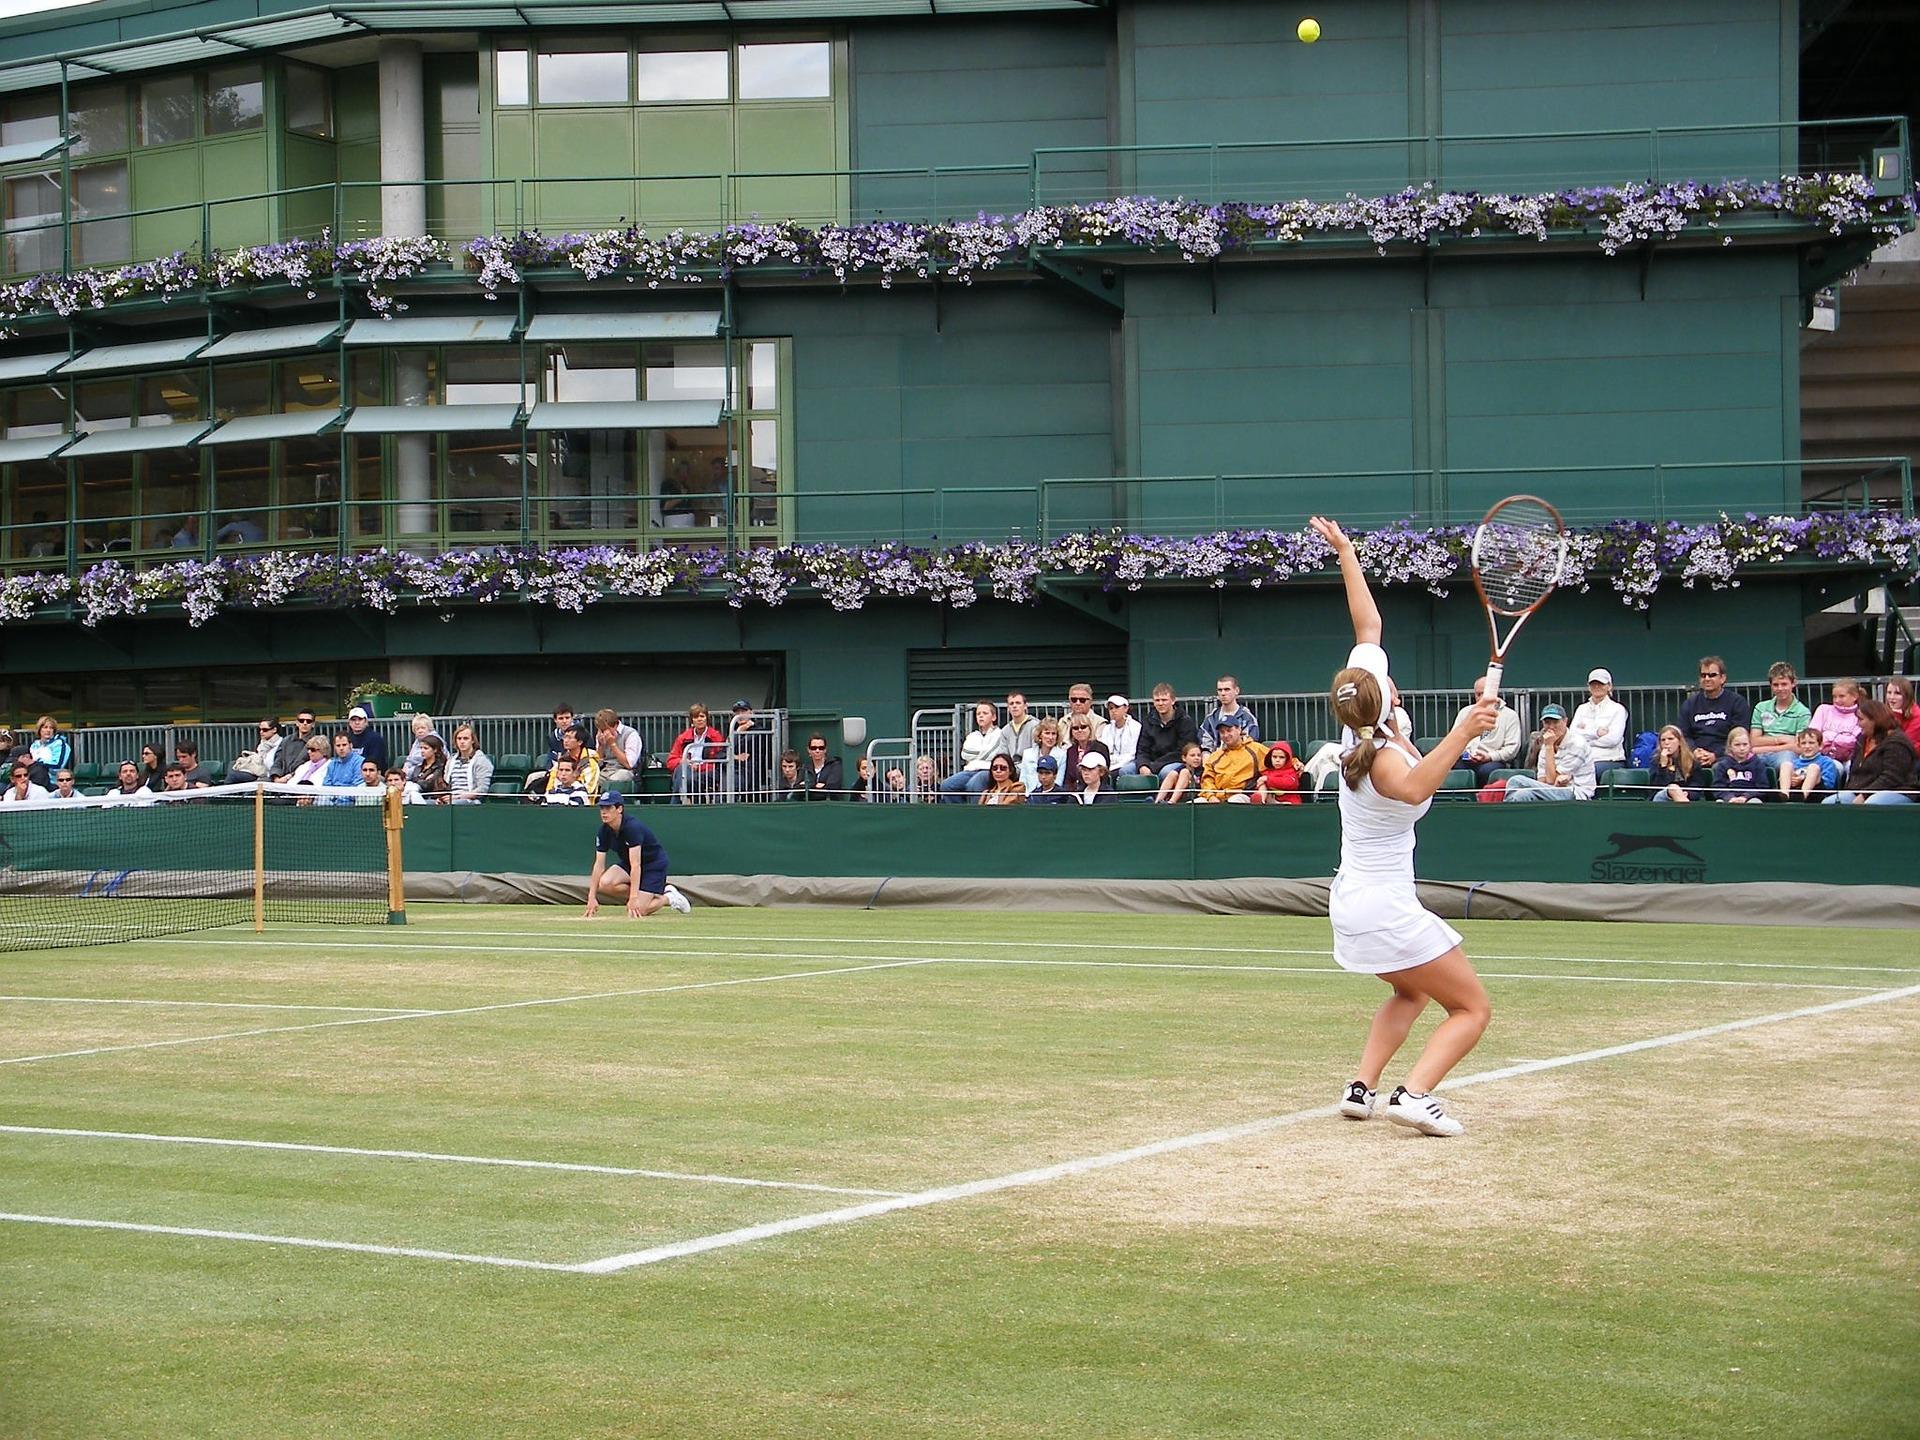 Wimbledon 2018 : Jamie Murray atteint la finale du double mixte avec Victoria Azarenka